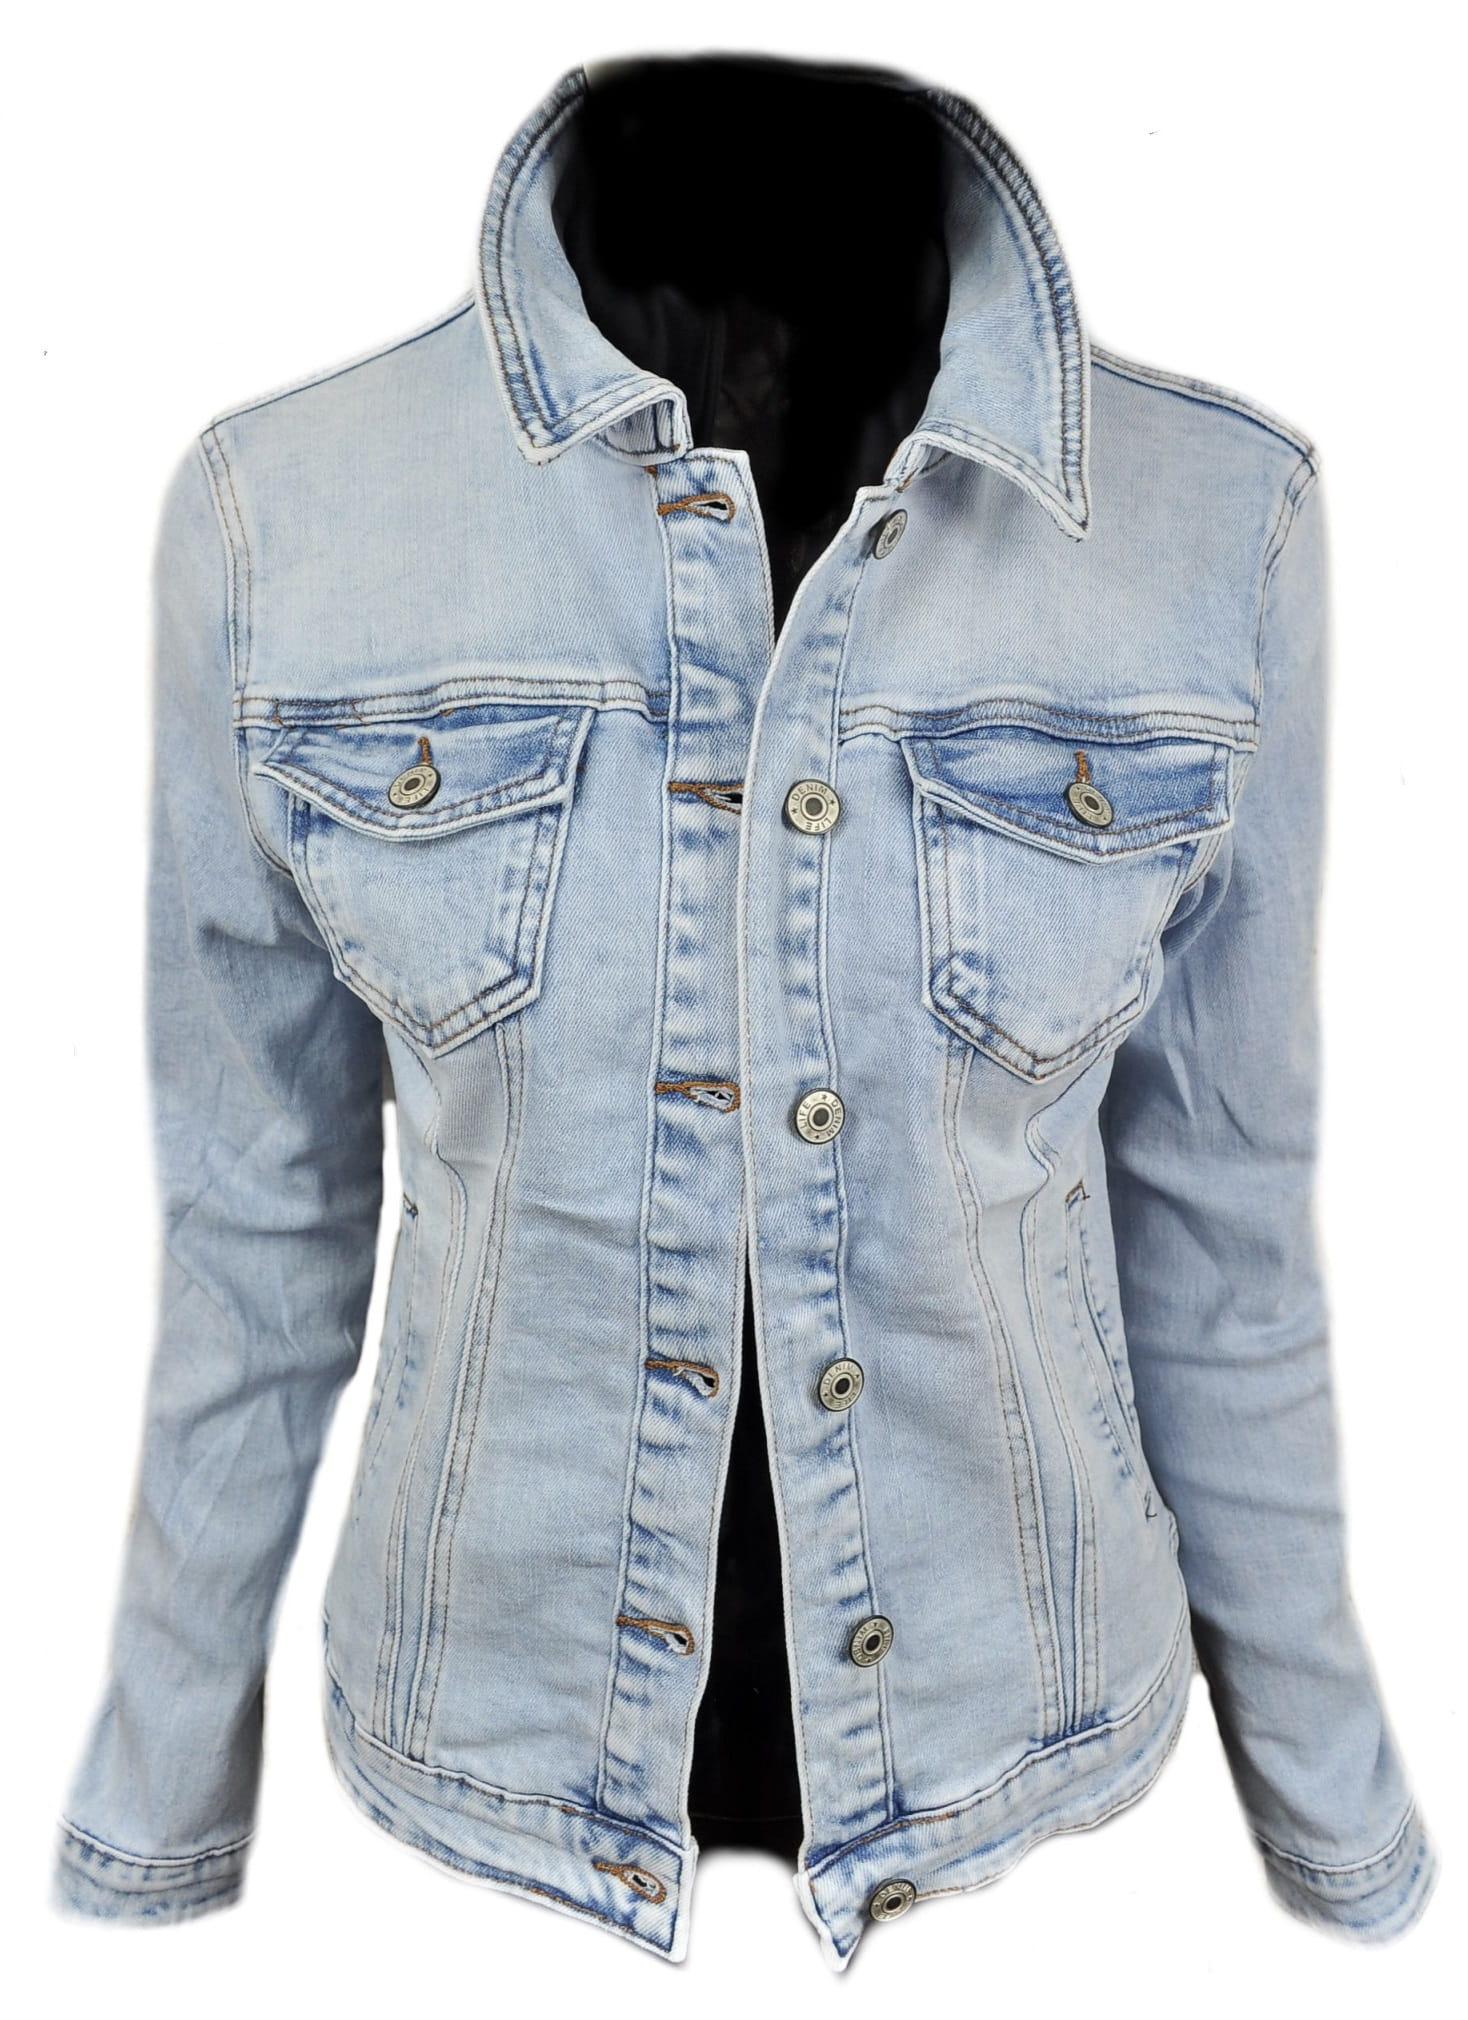 Wiosenna jeansowa damska kurtka jeans katana jasna - 050